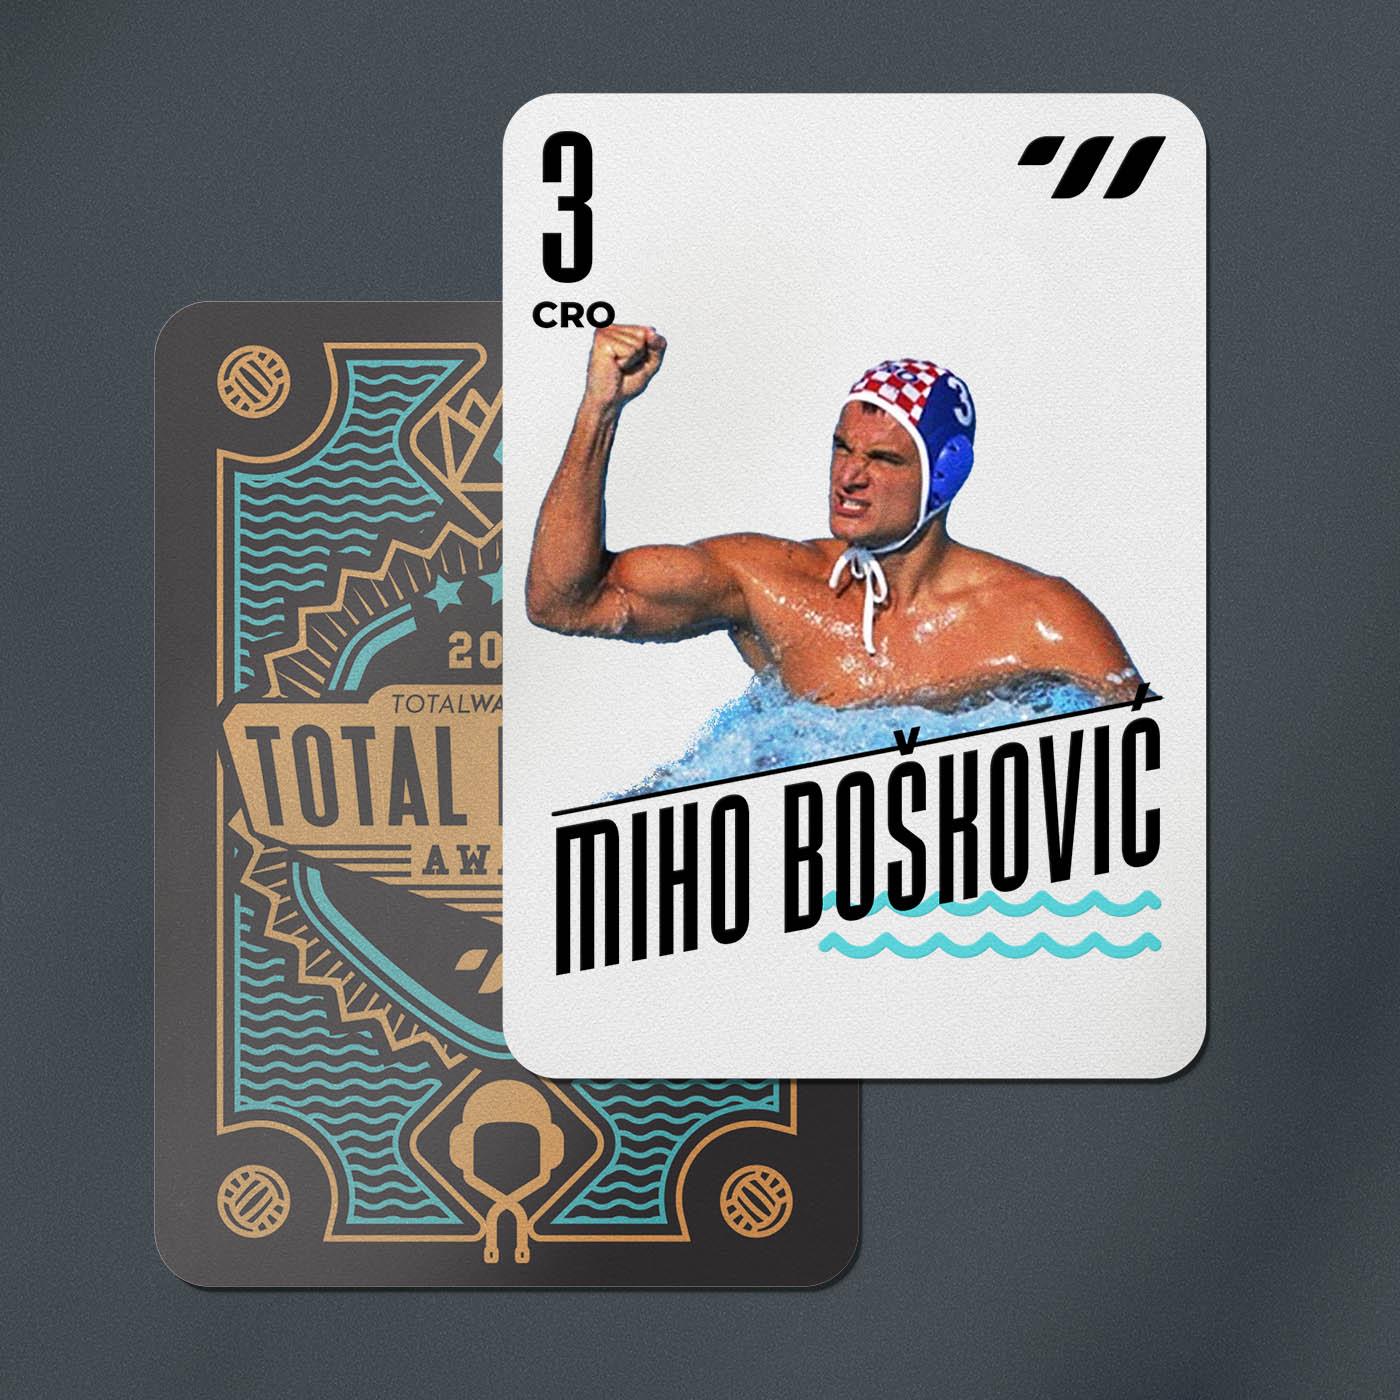 RIGHT SIDE - Miho Boskovic (CRO)